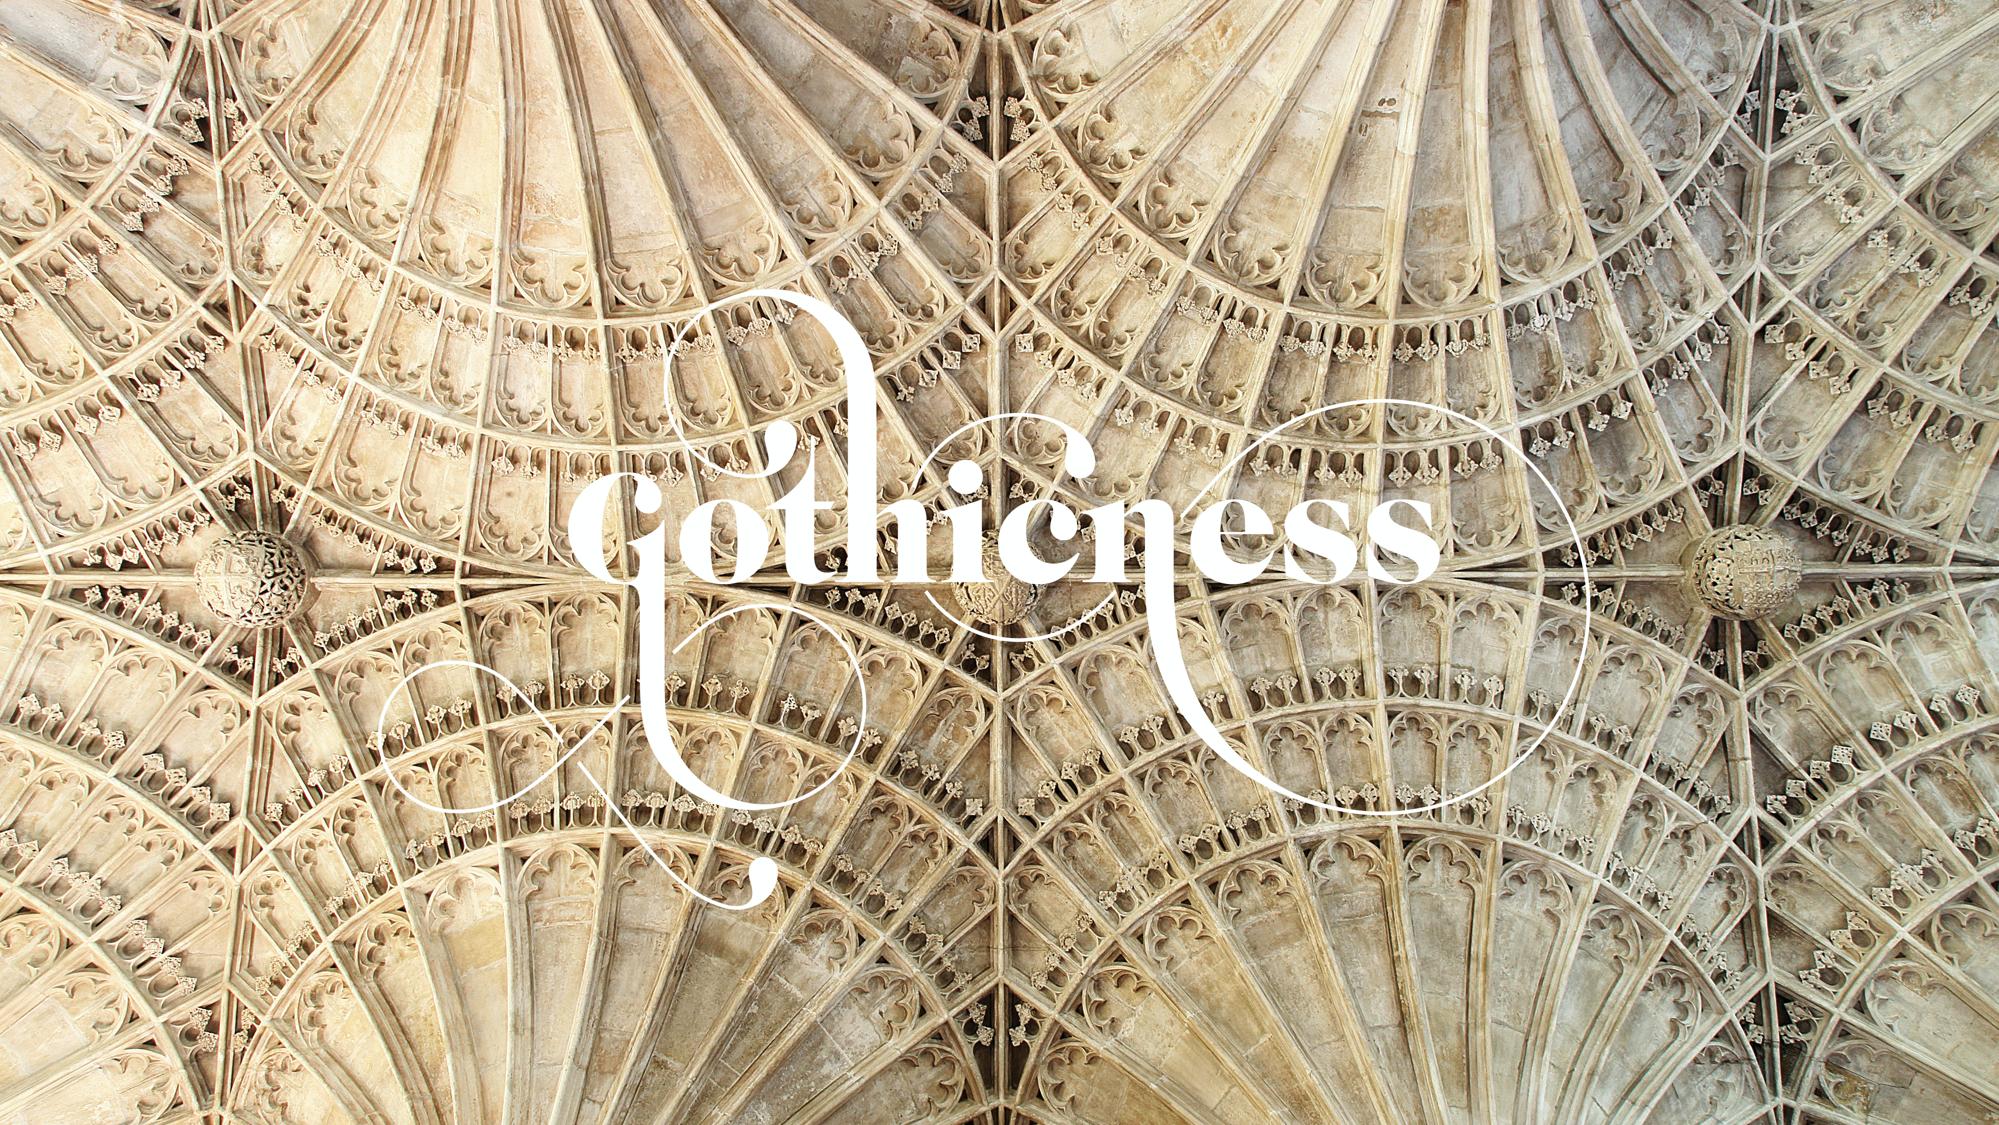 Gothicness